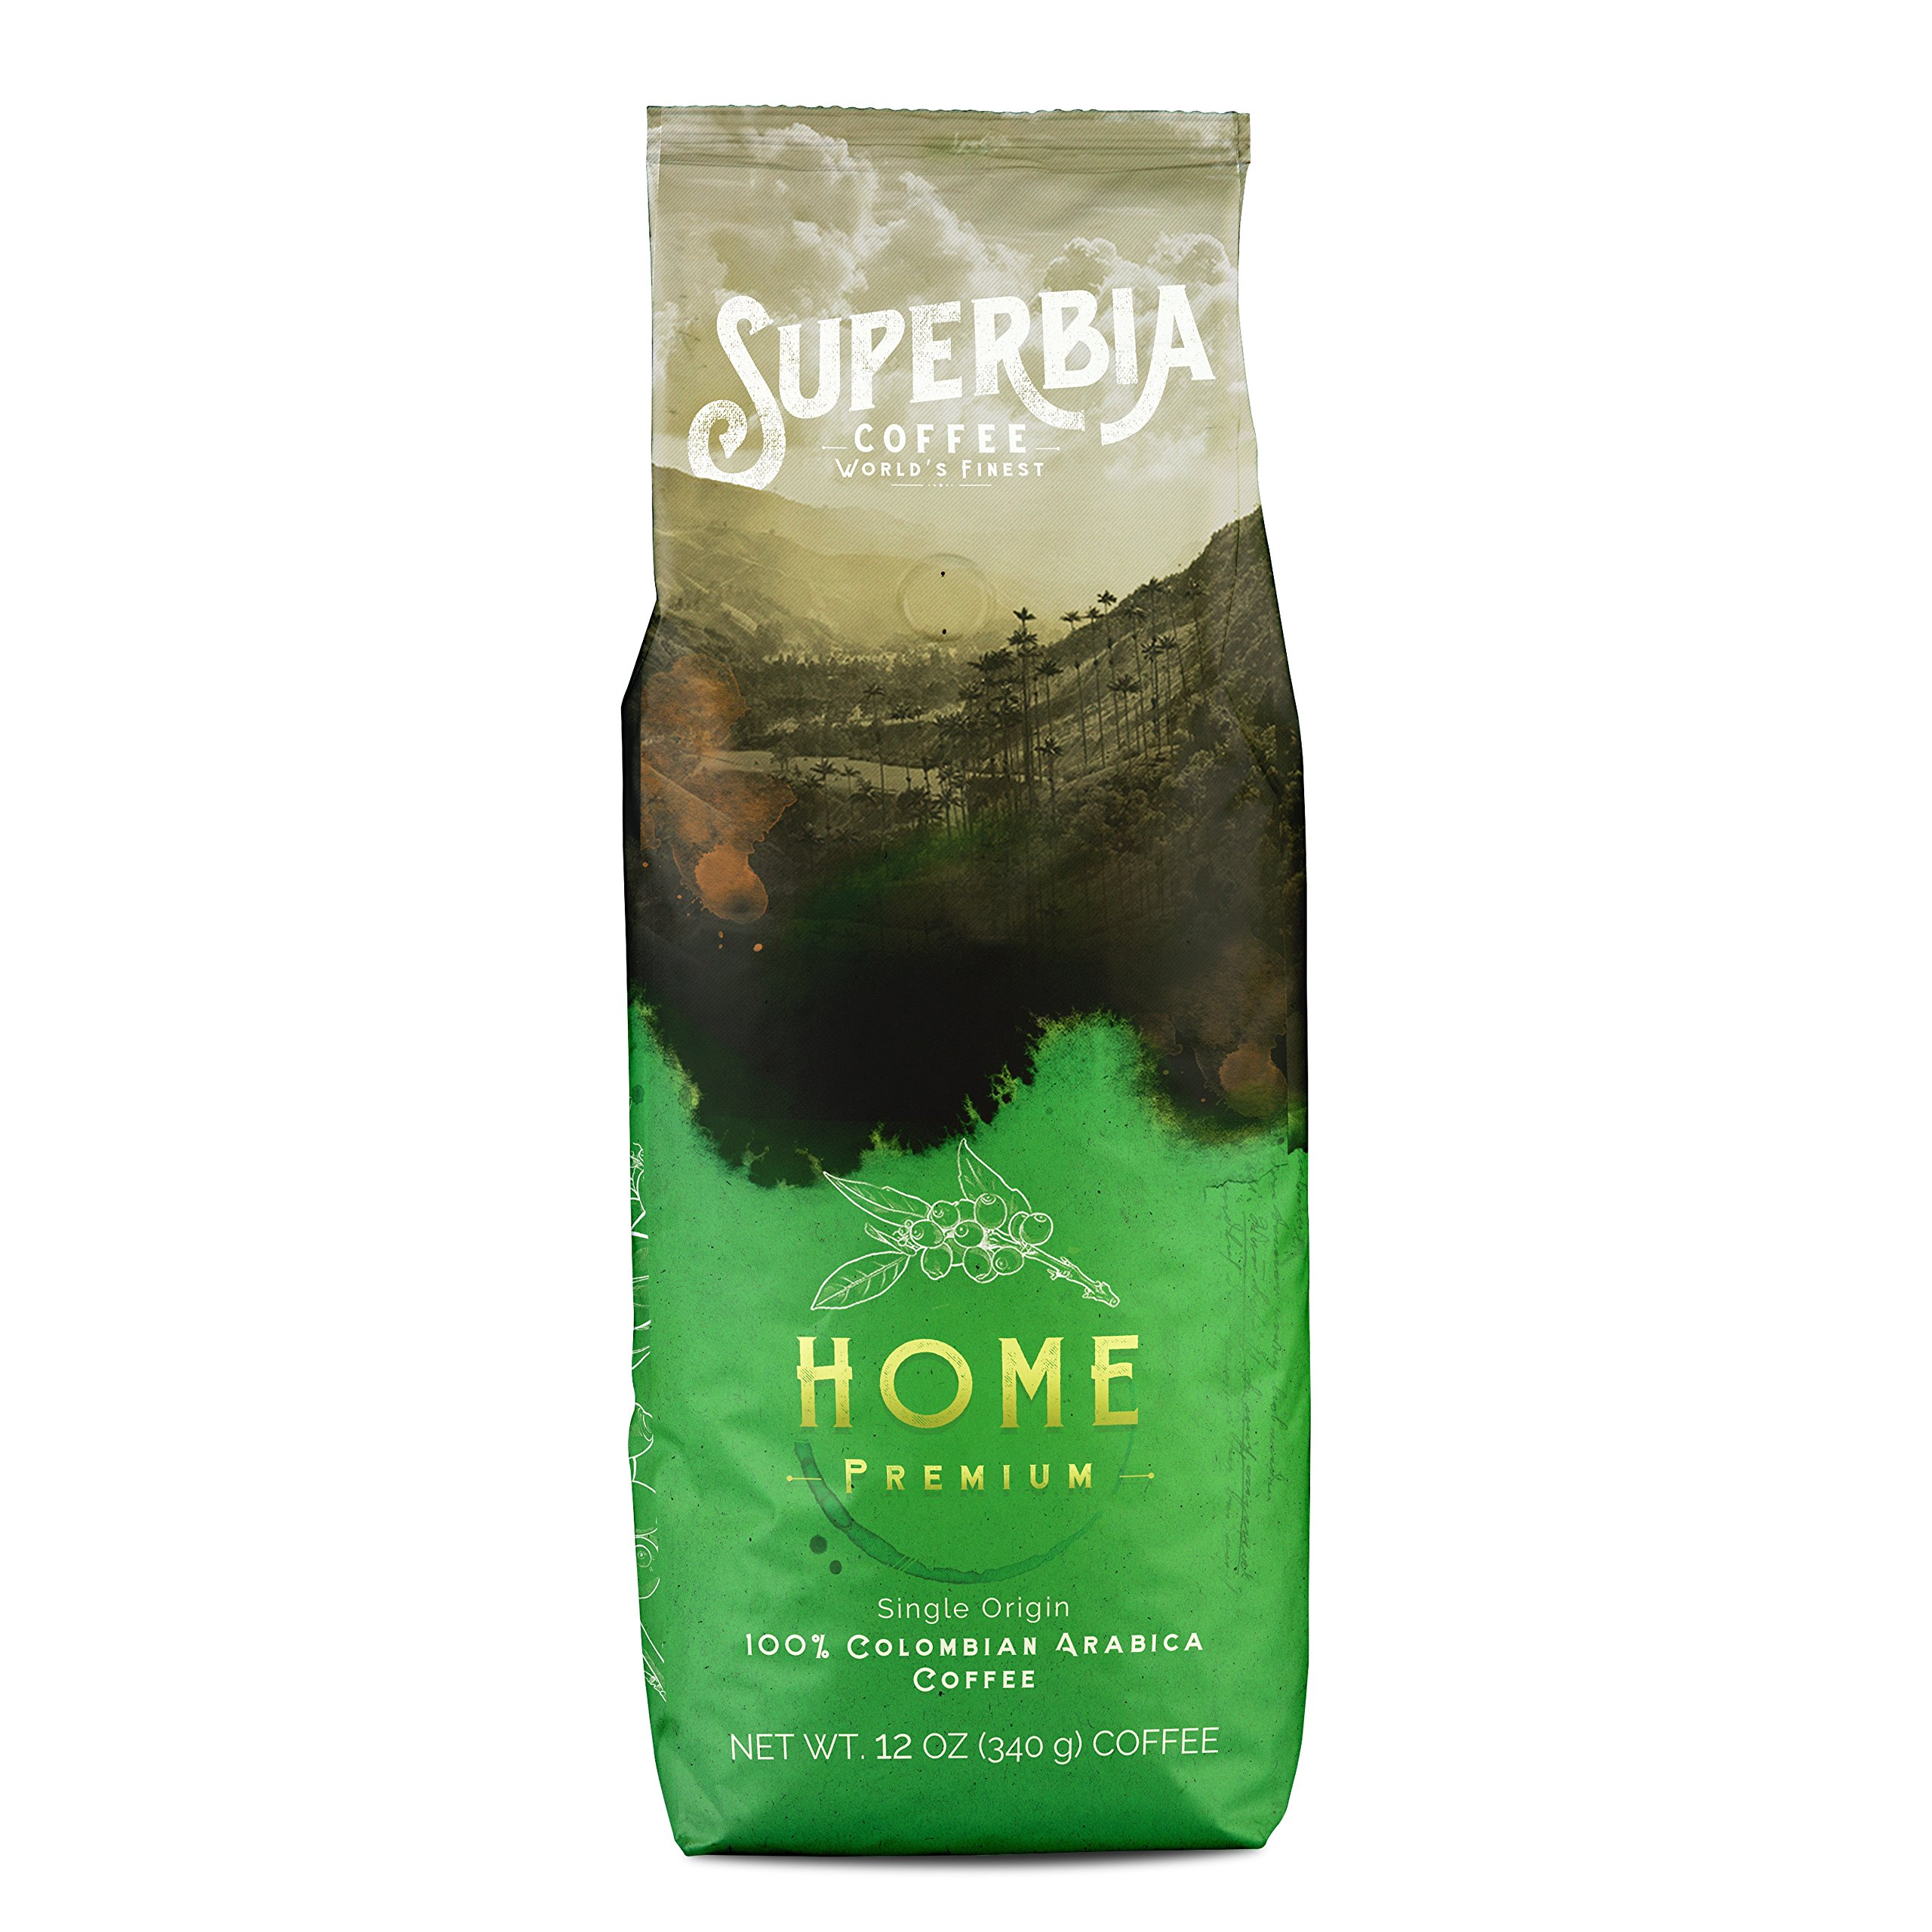 Superbia Coffee Home Premium 12Oz, 100% Colombian Coffee, Single Origin, Ground, Medium Roast, Amazing Flavor, Traceable to the farm, Superior Specialty Coffee